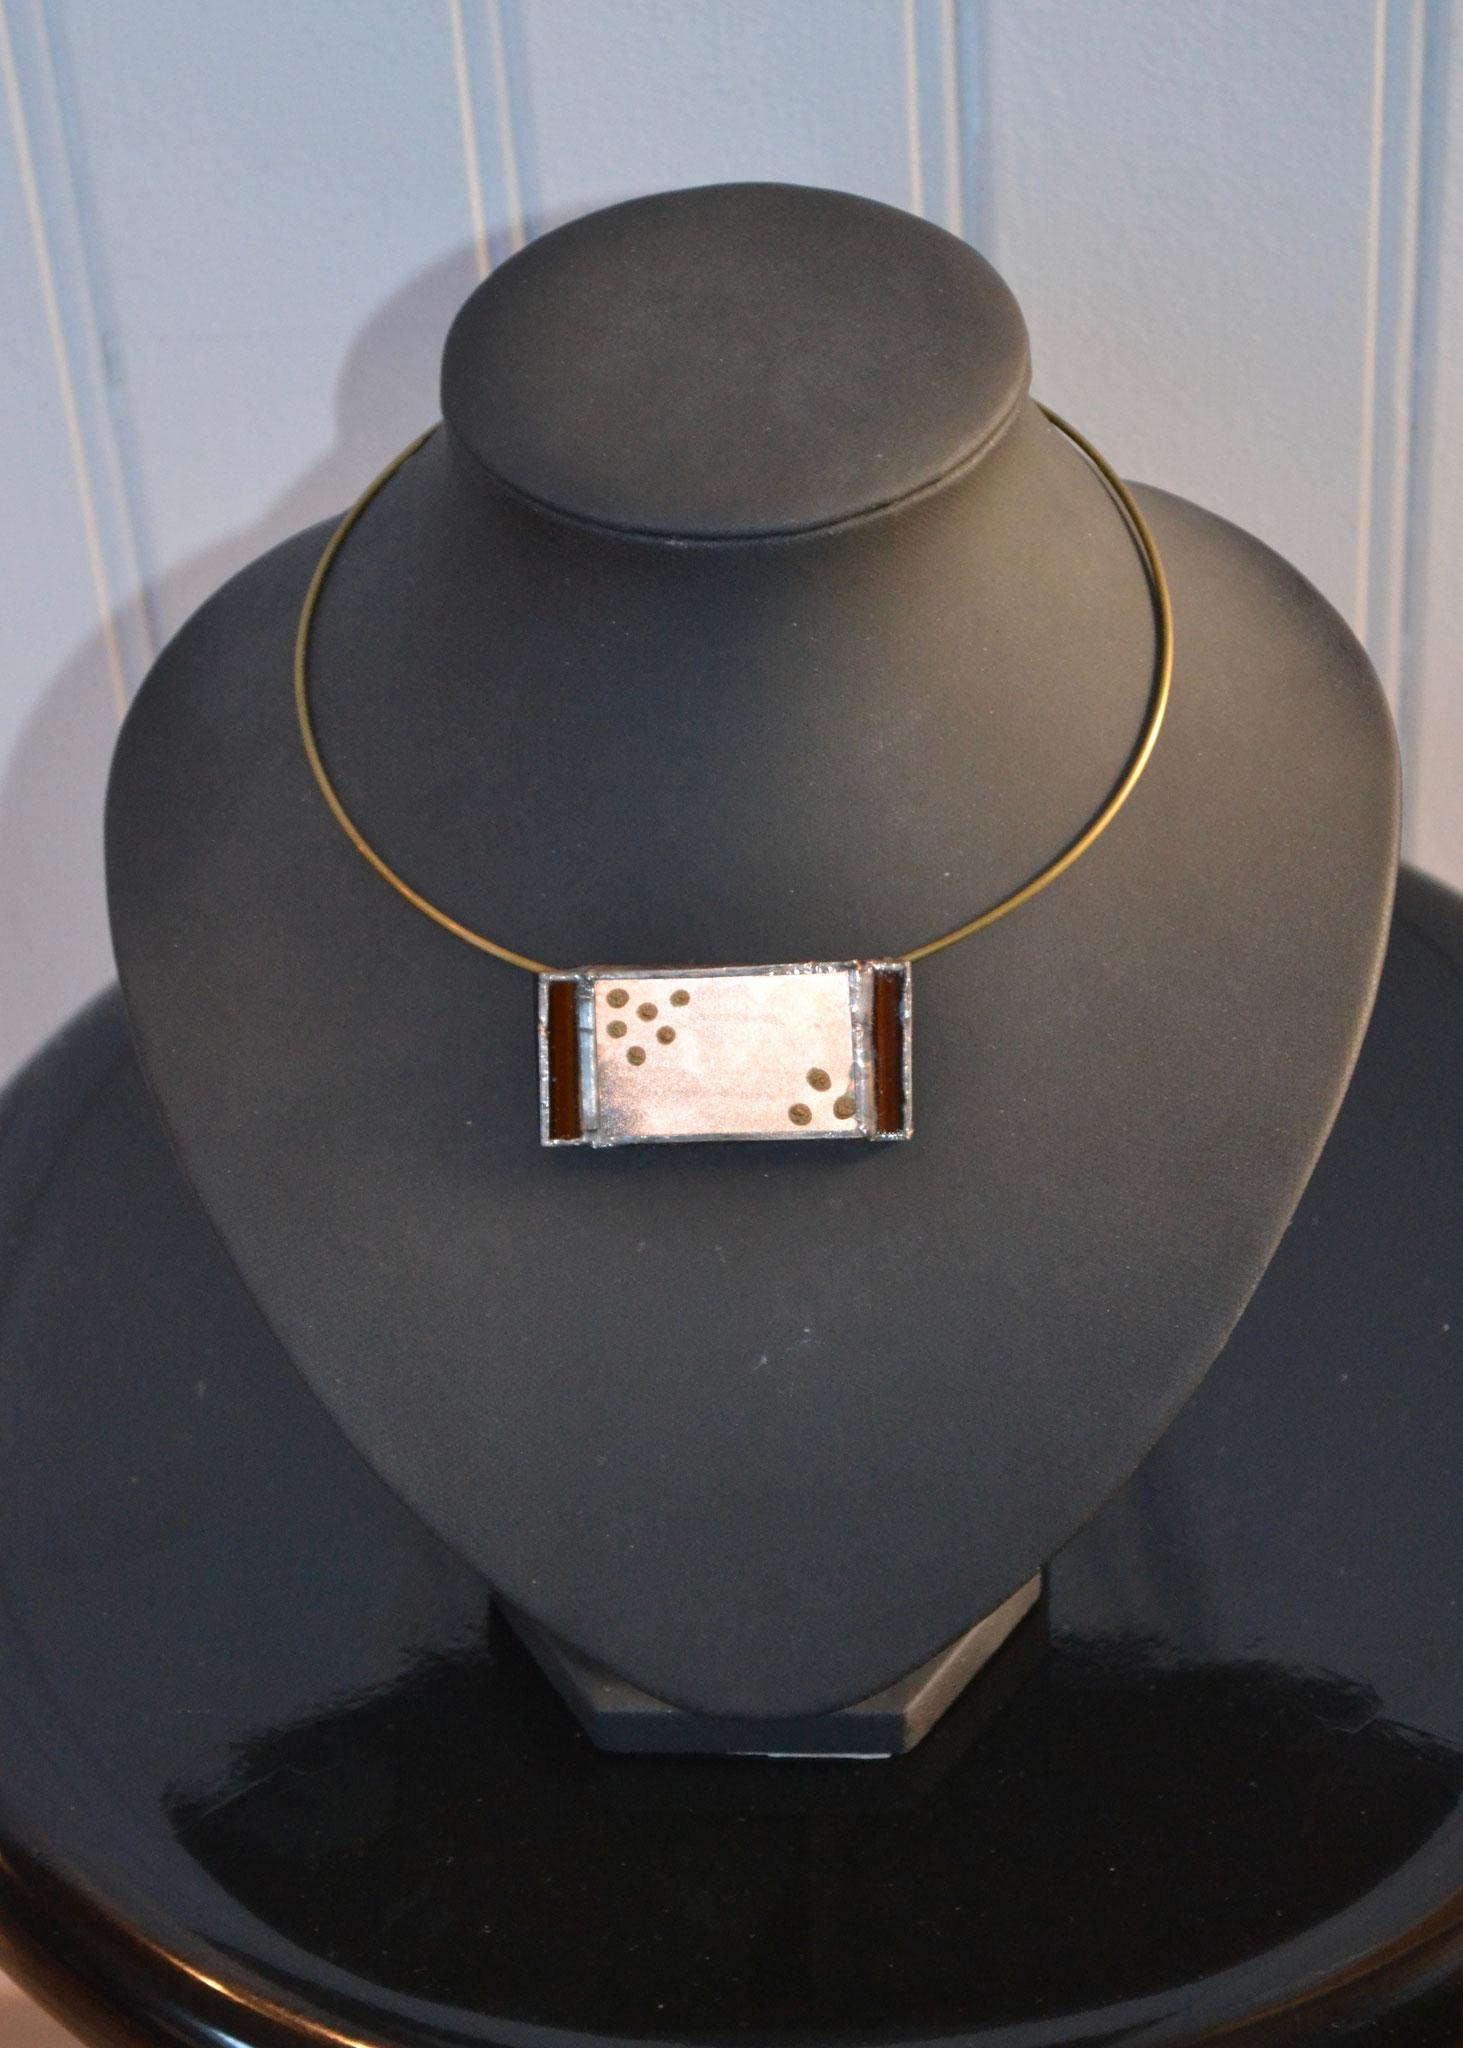 Pendentif Tiffany poudre de cuivre entre 2 verres (5 x 2 cm) 19€